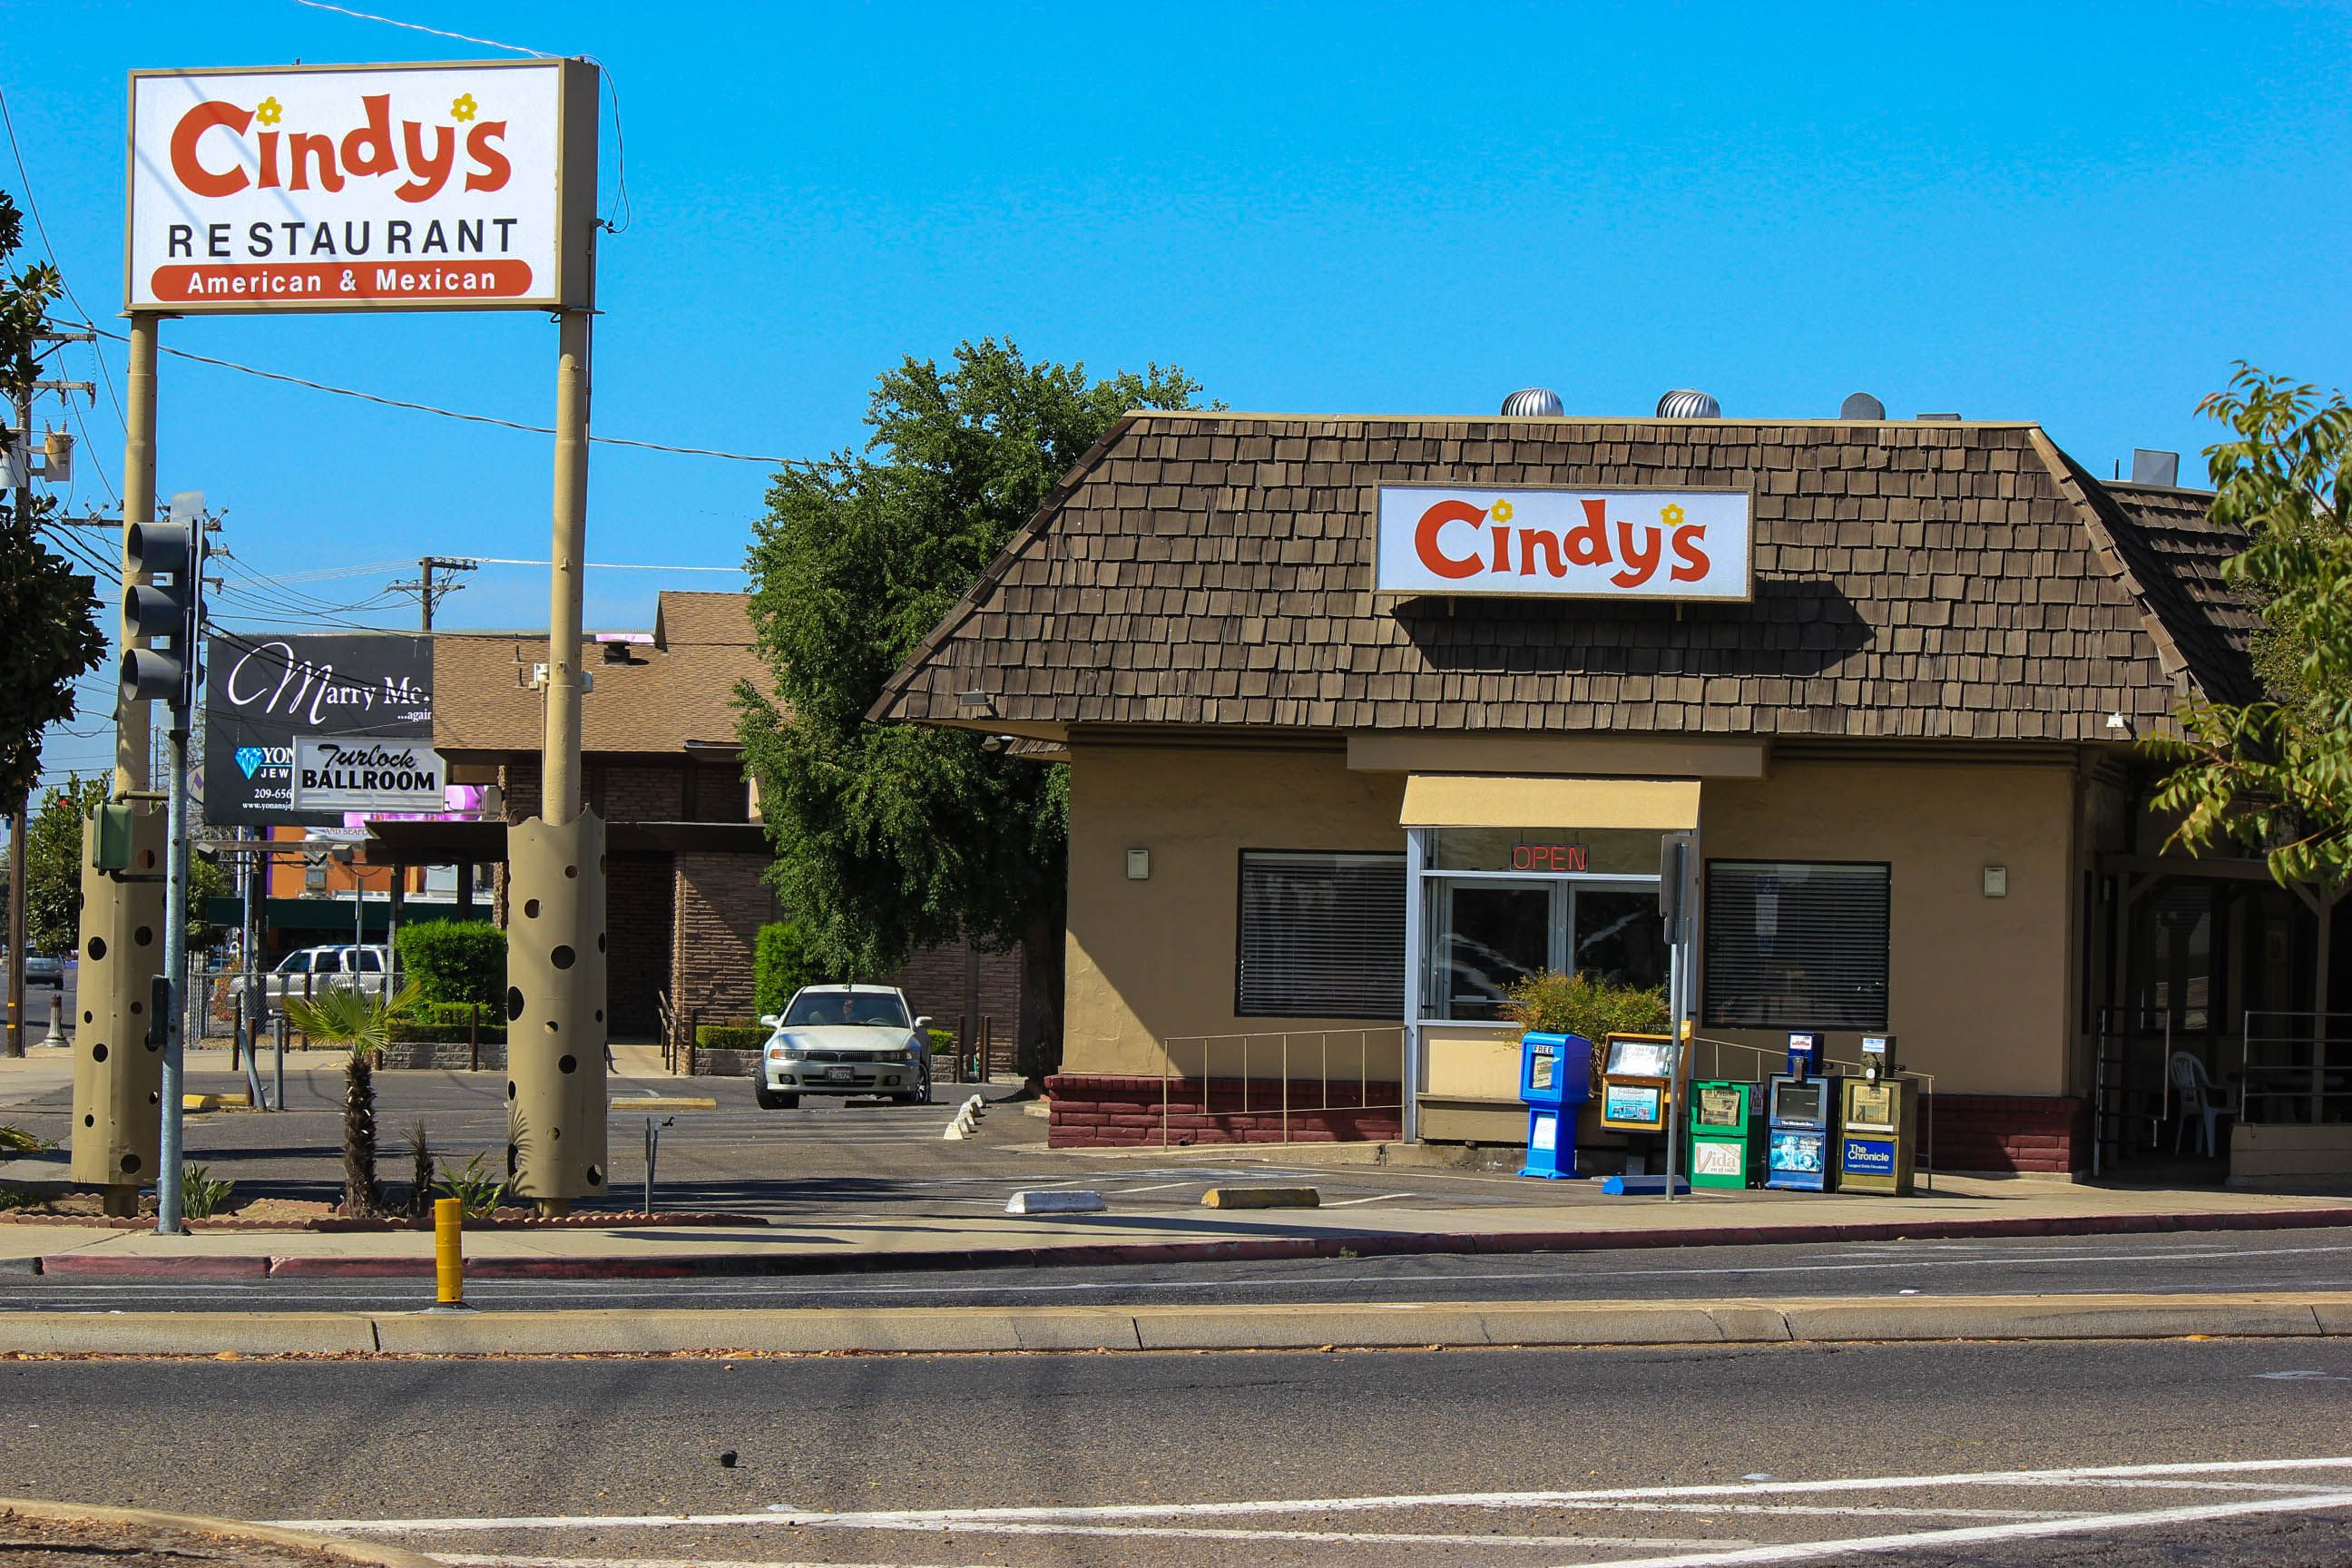 Cindy S Restaurant Turlock Ca Excellent Bbq In The Parking Lot Summer Love It